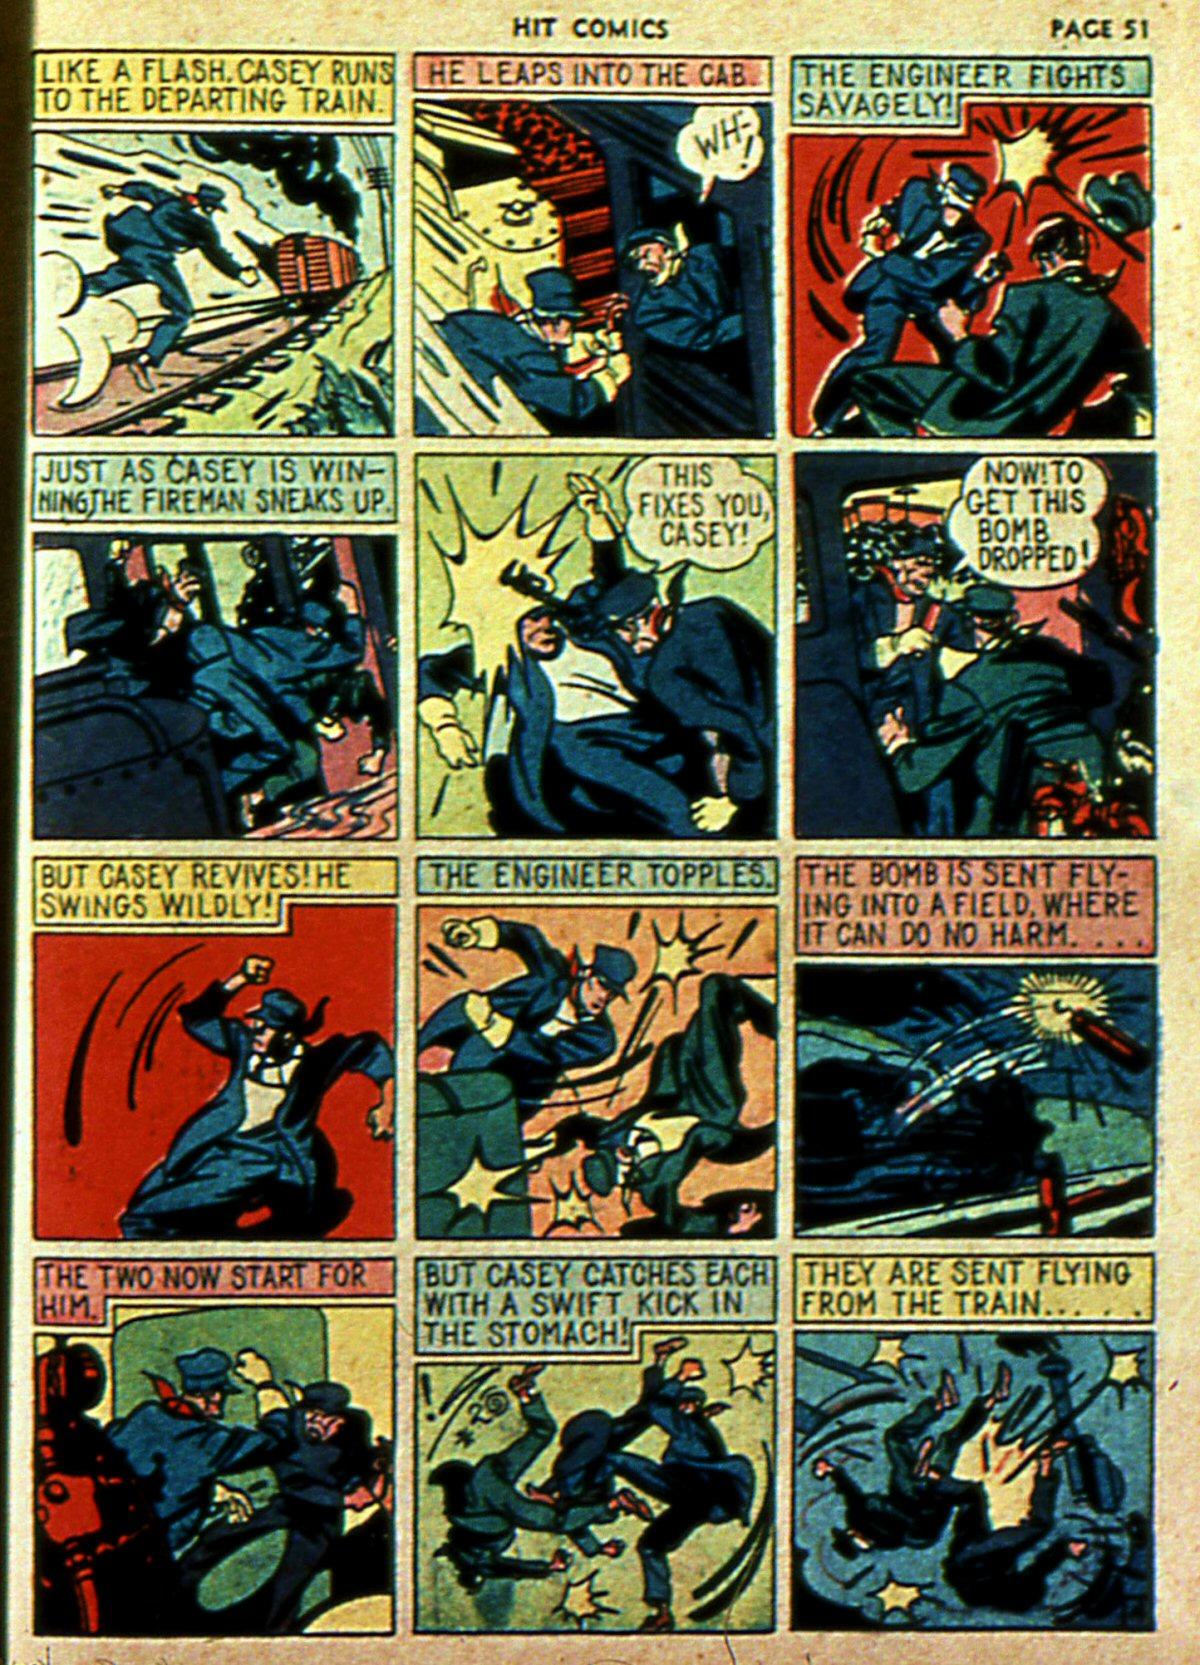 Read online Hit Comics comic -  Issue #2 - 53